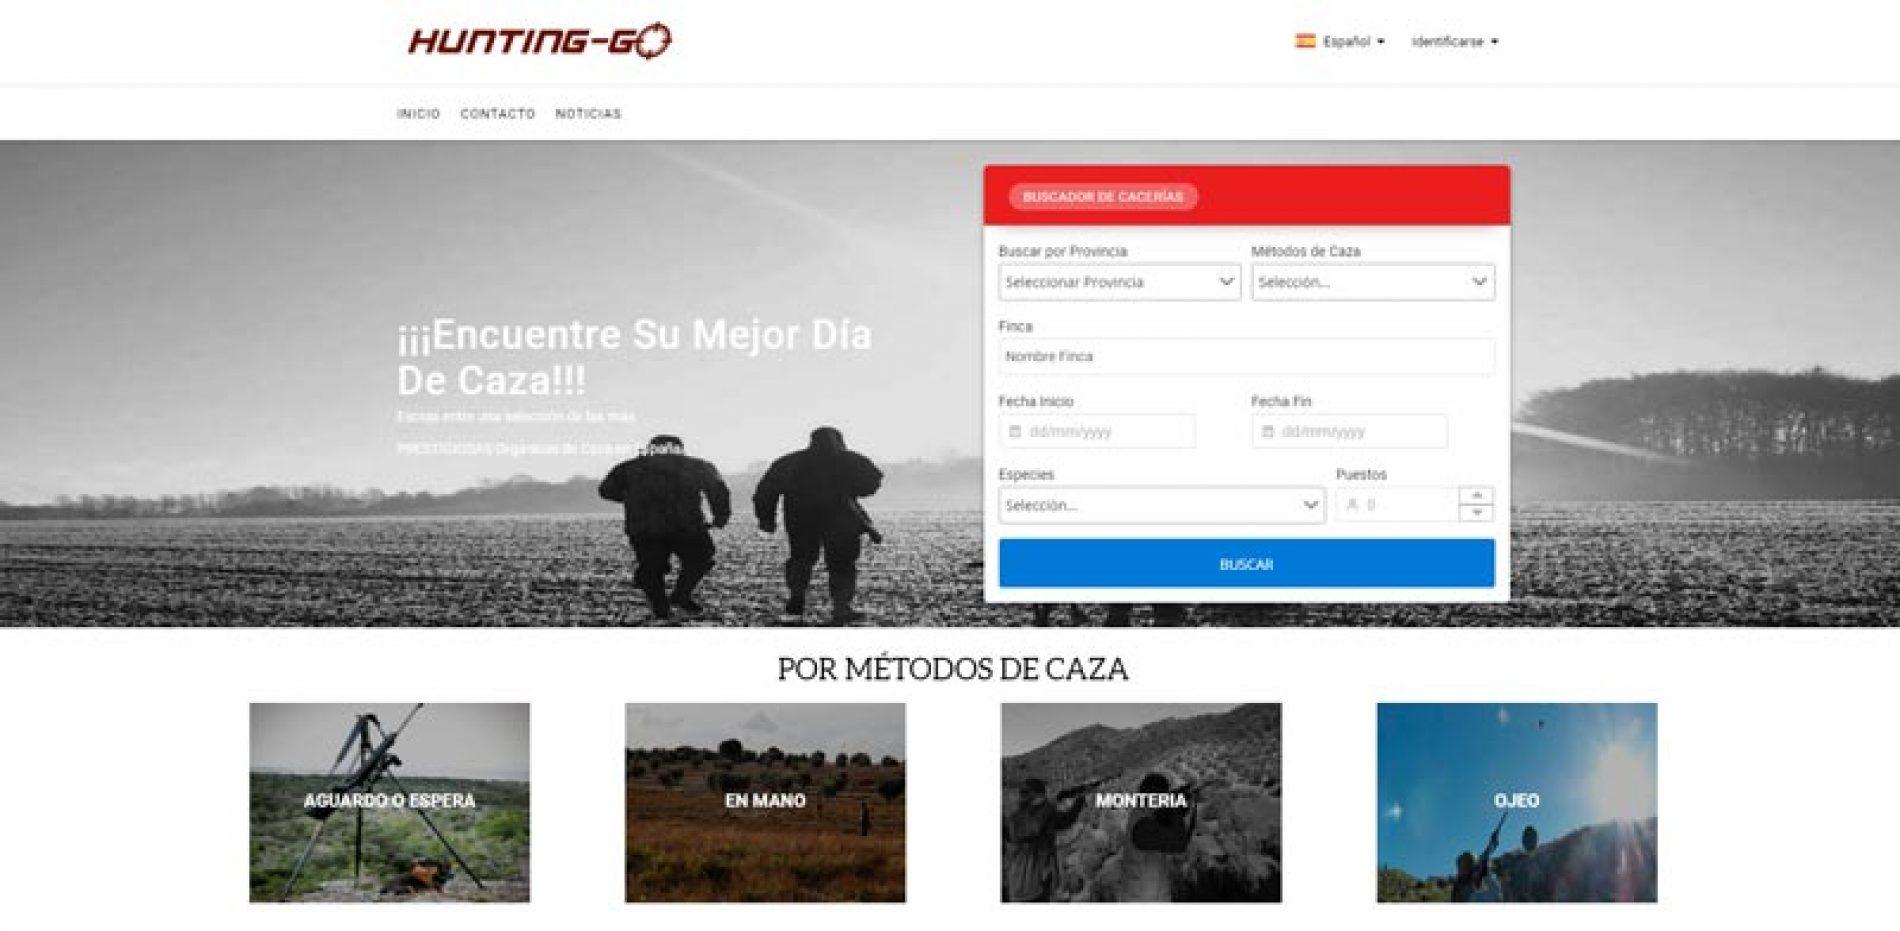 Nace hunting-go.com, para facilitar la vida del cazador